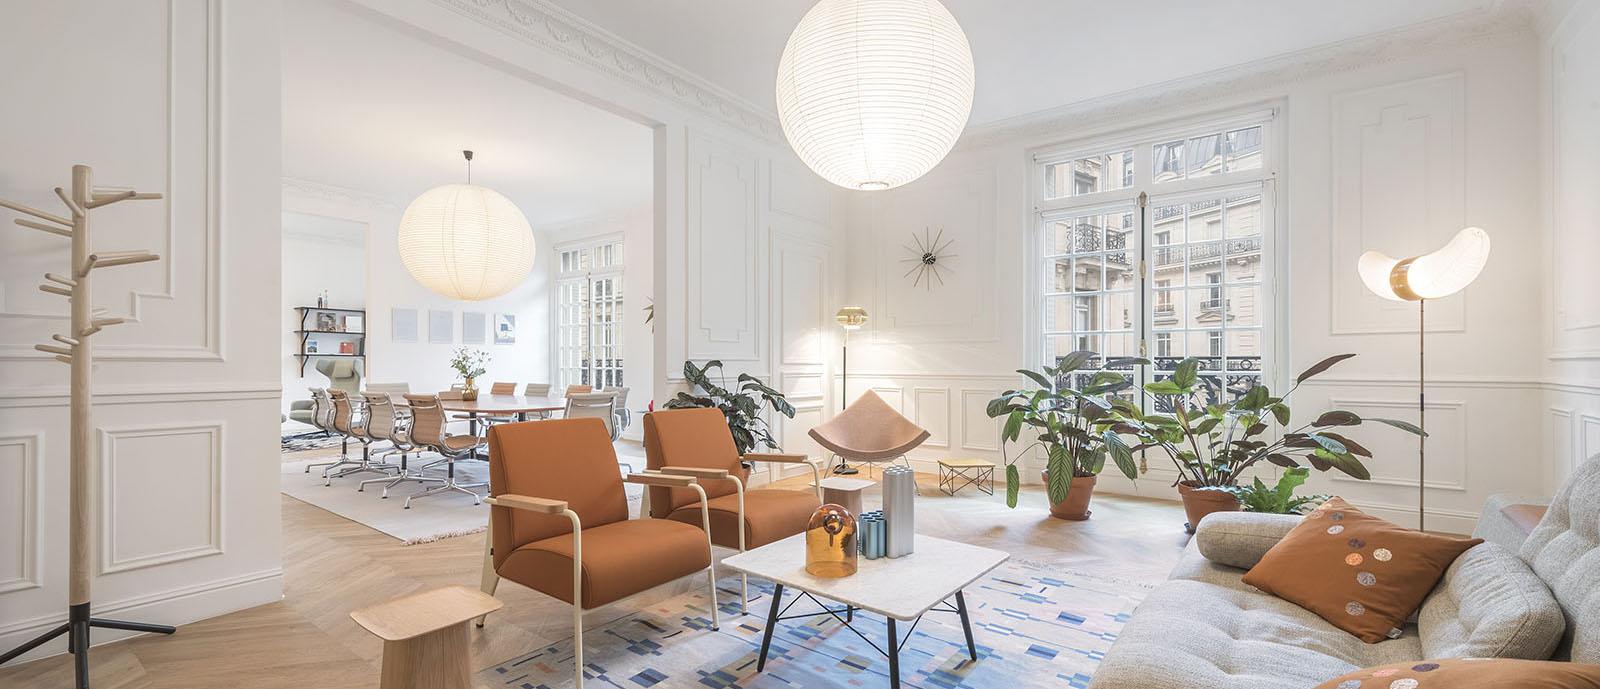 vitra nouveau showroom parisien volcan design. Black Bedroom Furniture Sets. Home Design Ideas